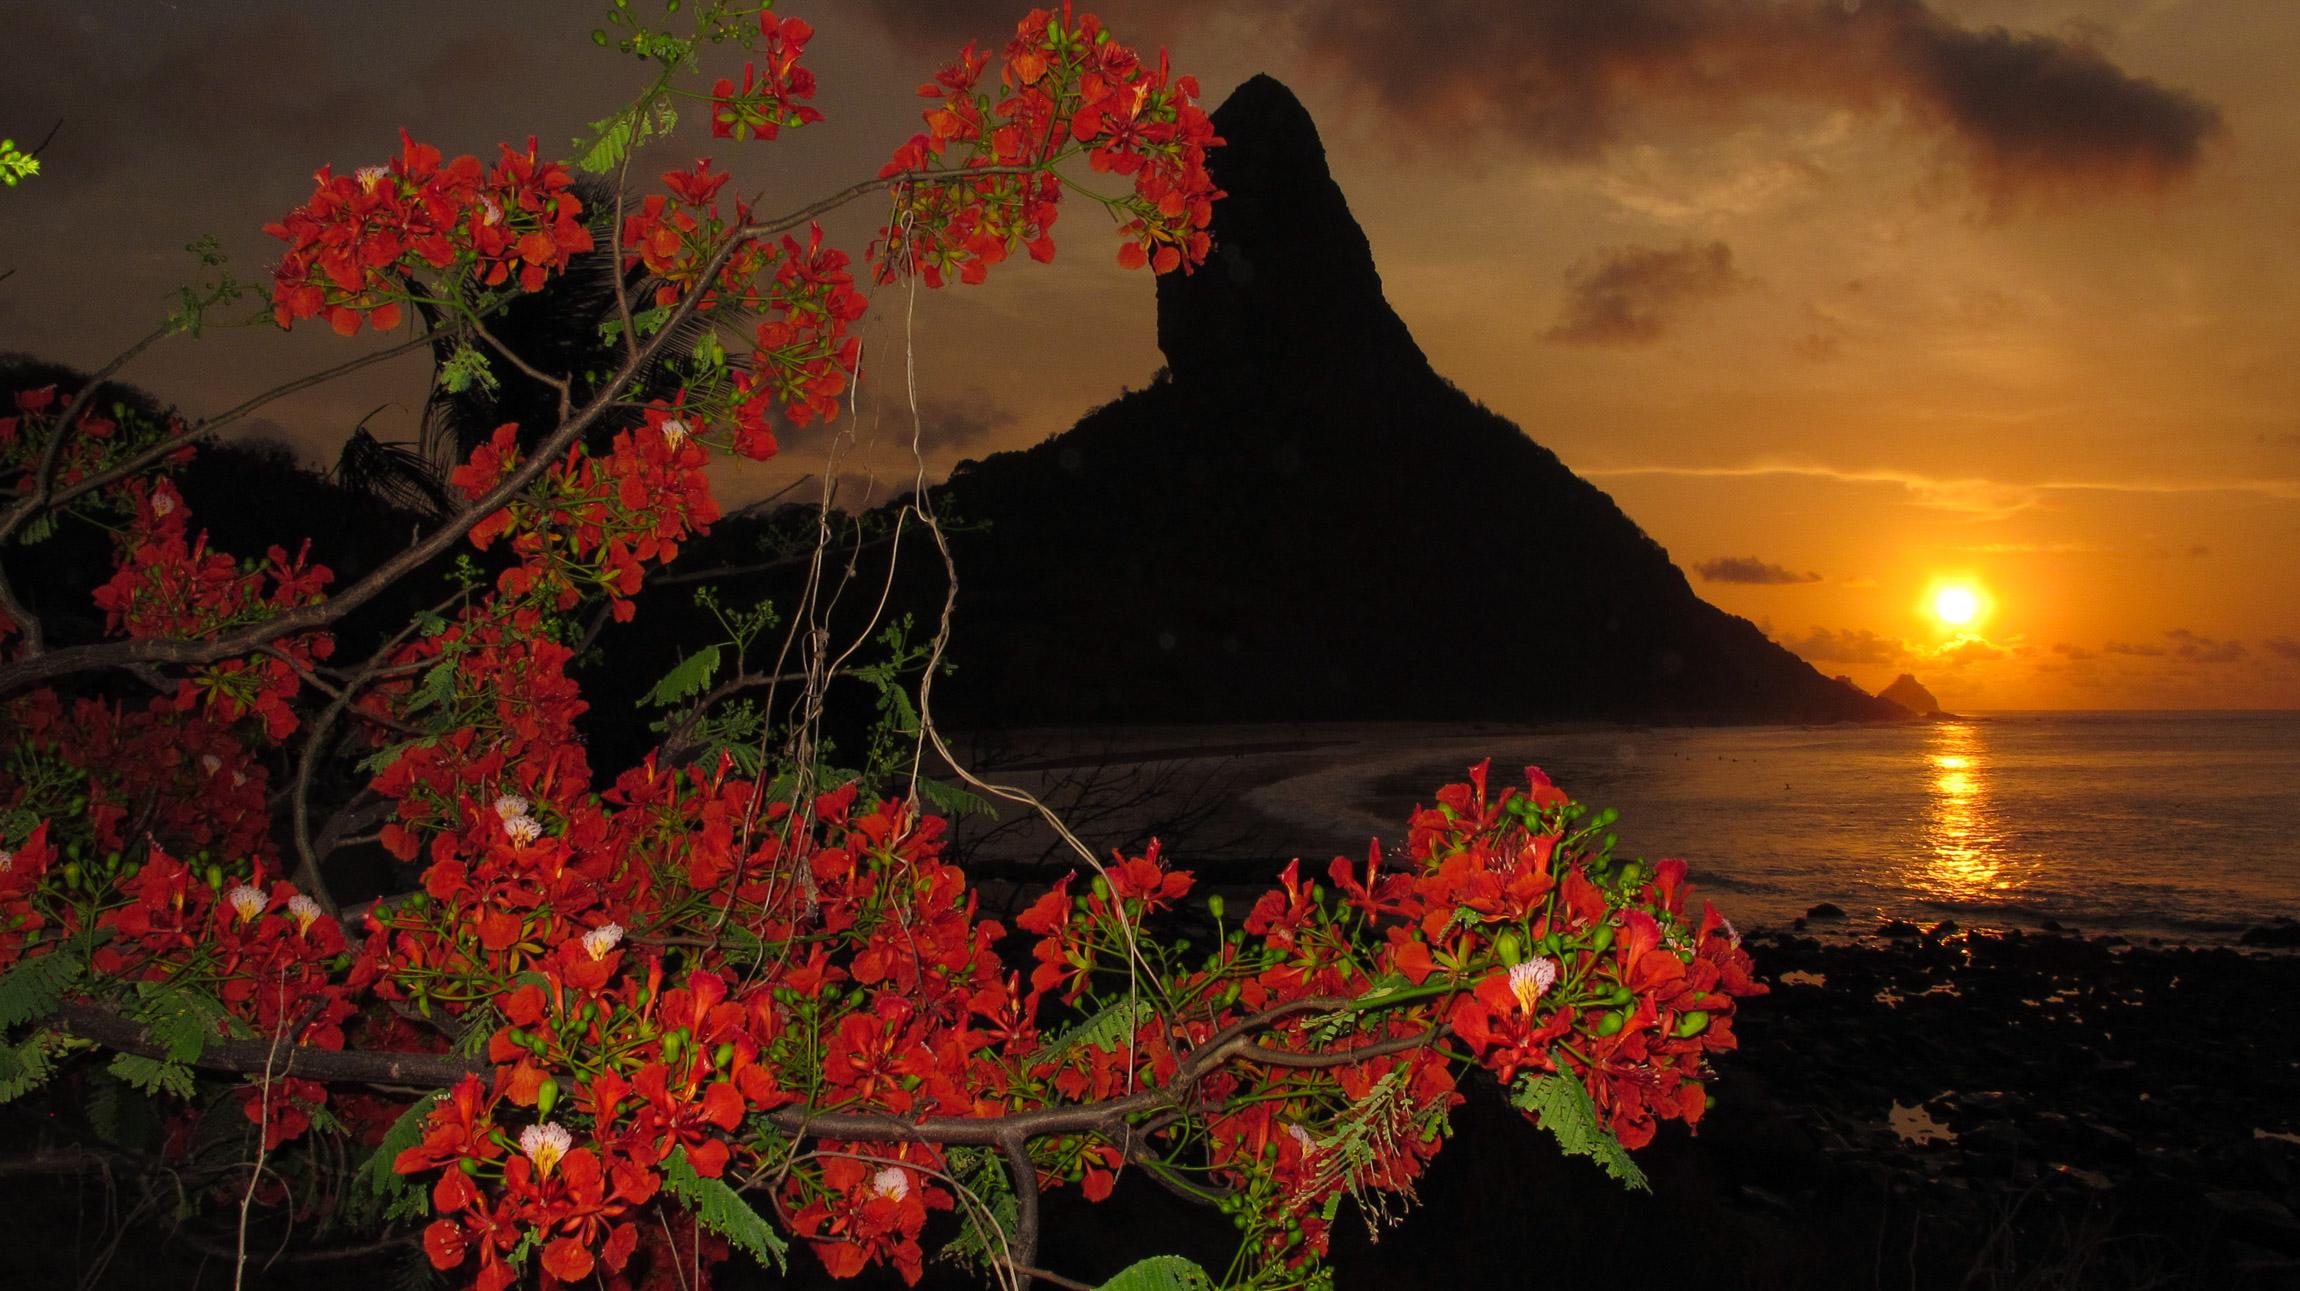 Pôr-do-sol sunset